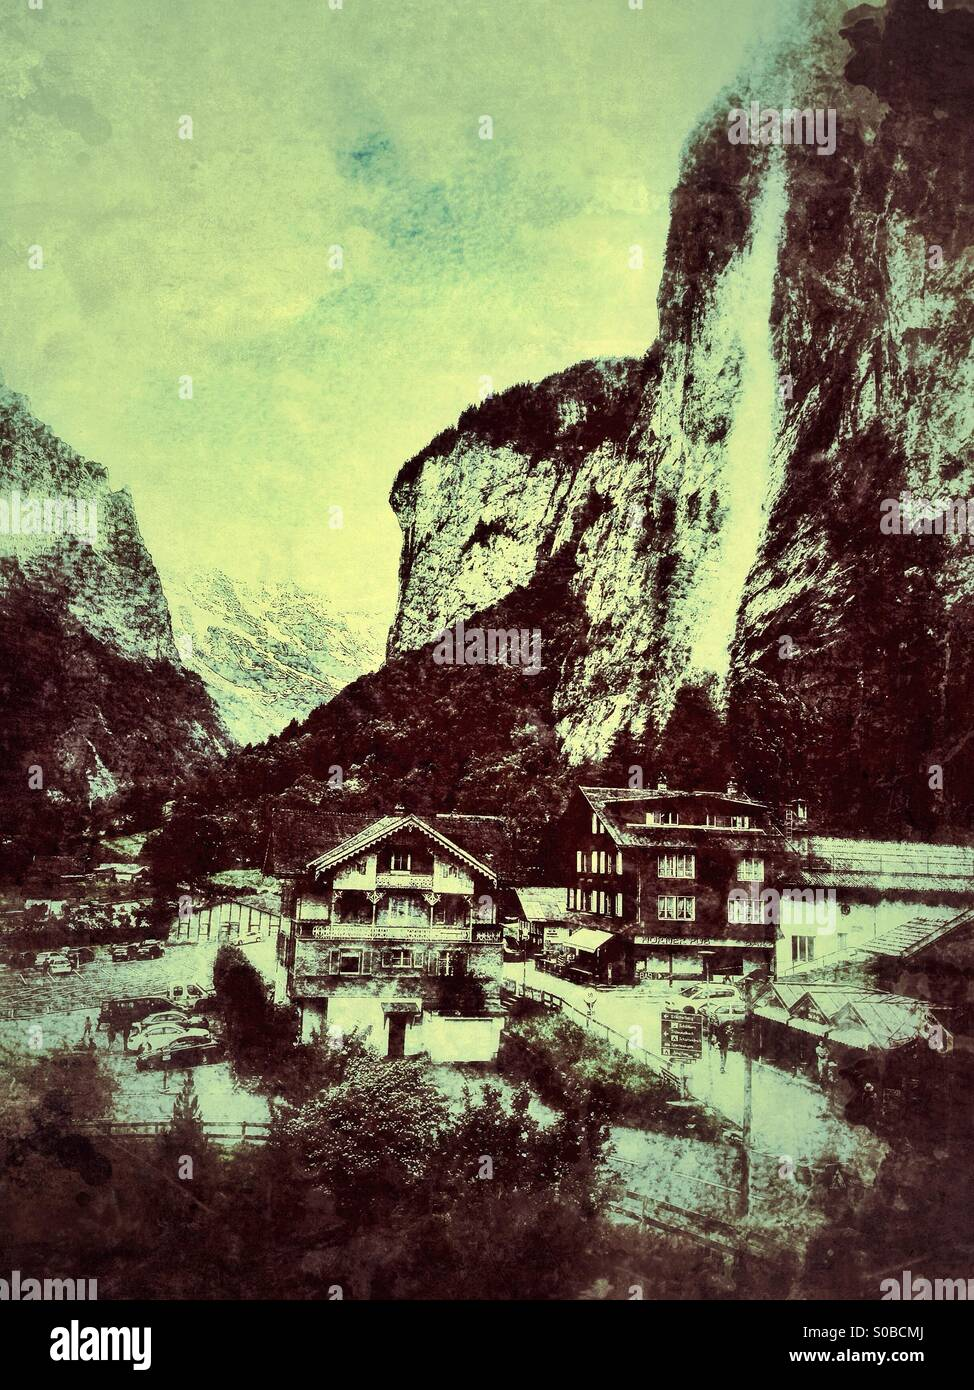 Swiss mountain retreat - Stock Image